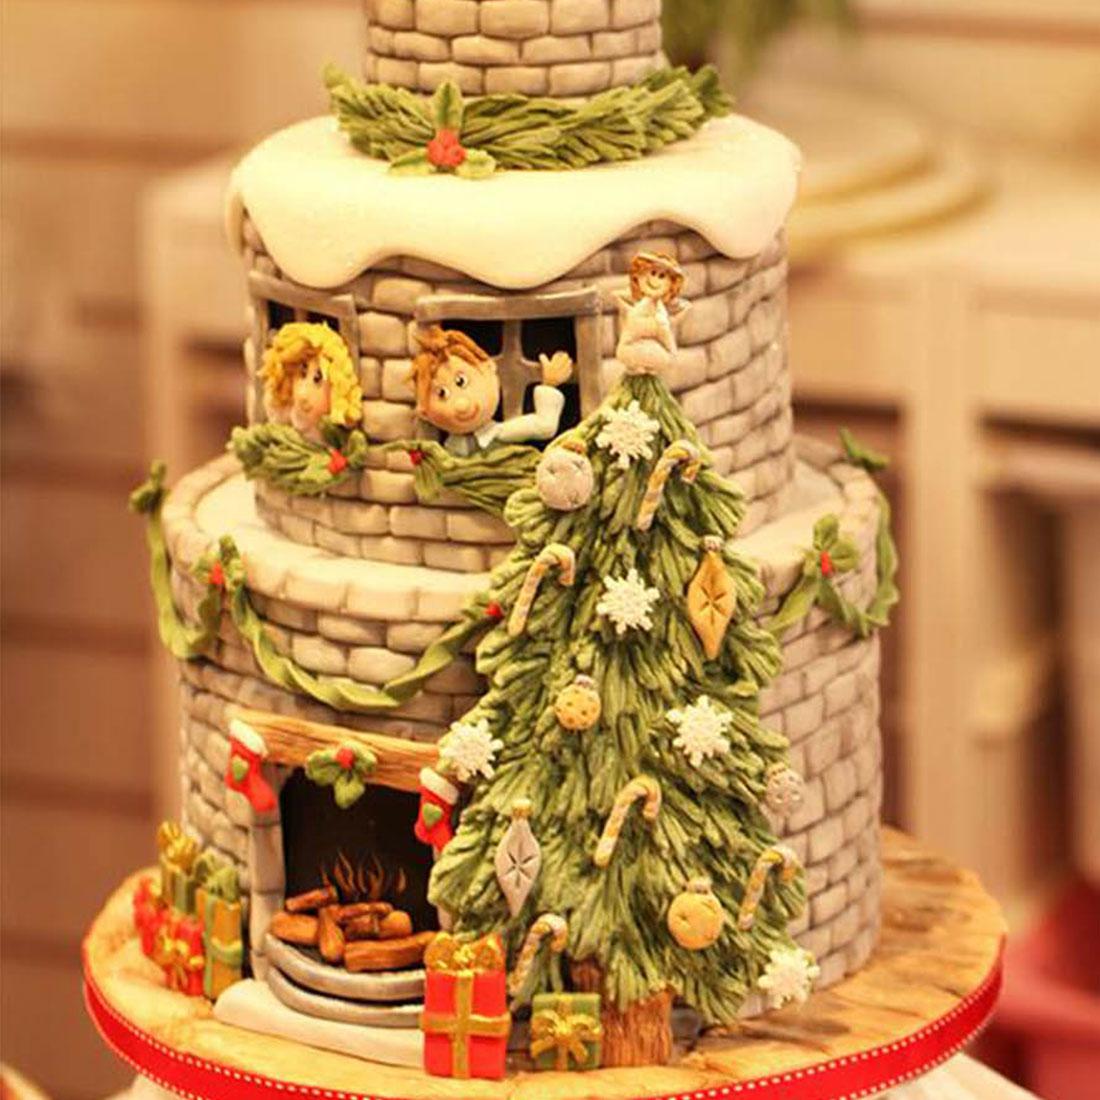 Nuevo árbol de Navidad copo de nieve molde de silicona arco decoración de borde de tarta Fondant moldes 3D Chocolate caramelo moldes